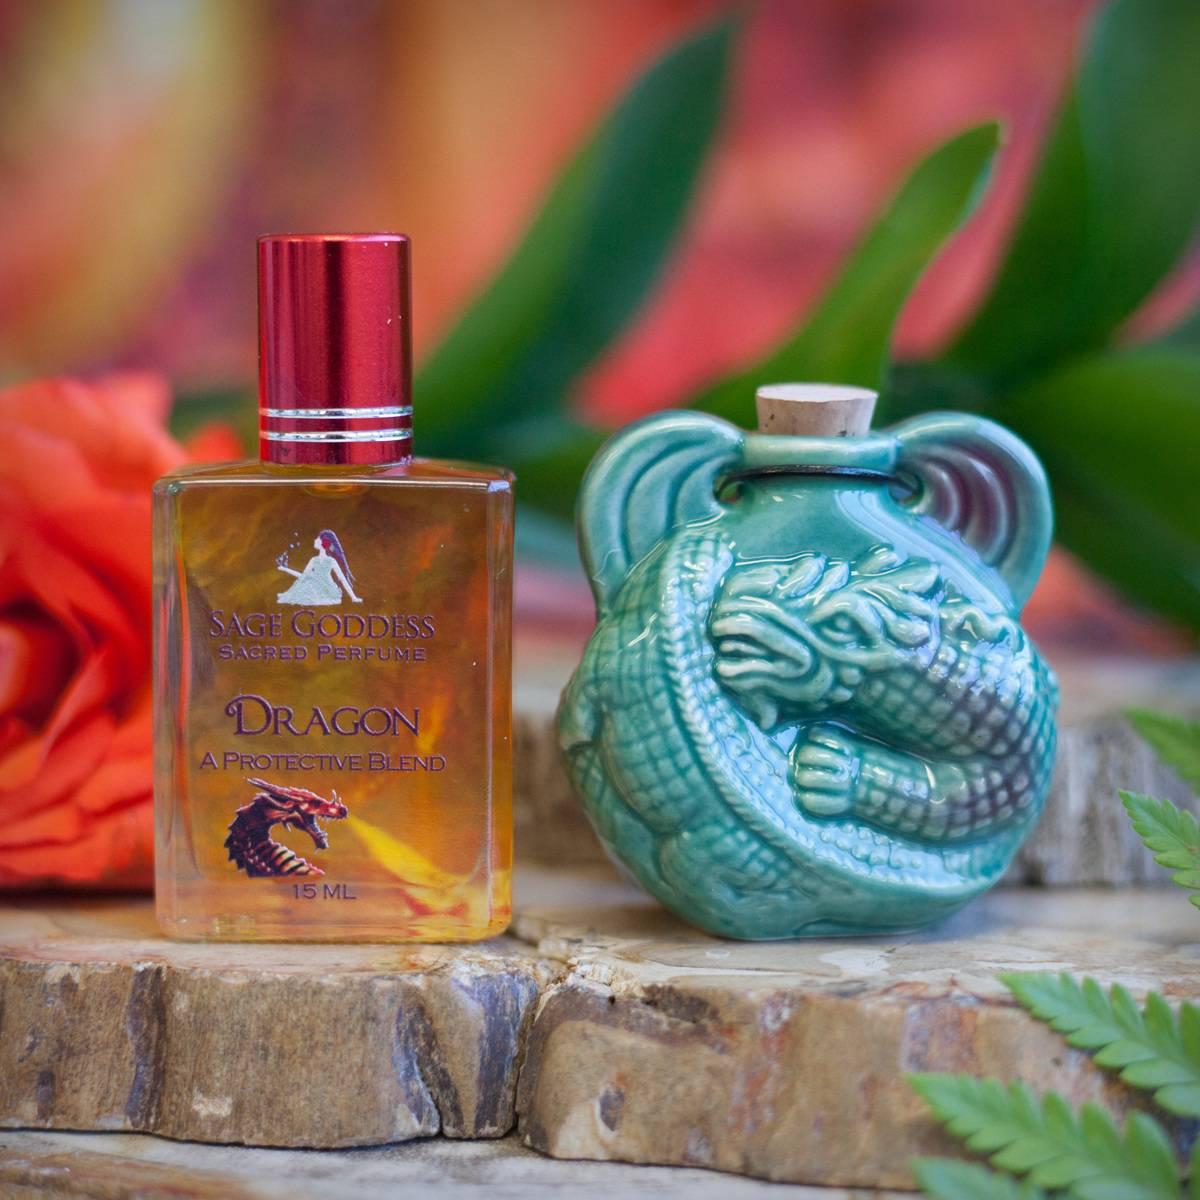 Dragon Apothecary Bottle with Dragon Perfume on 5_30